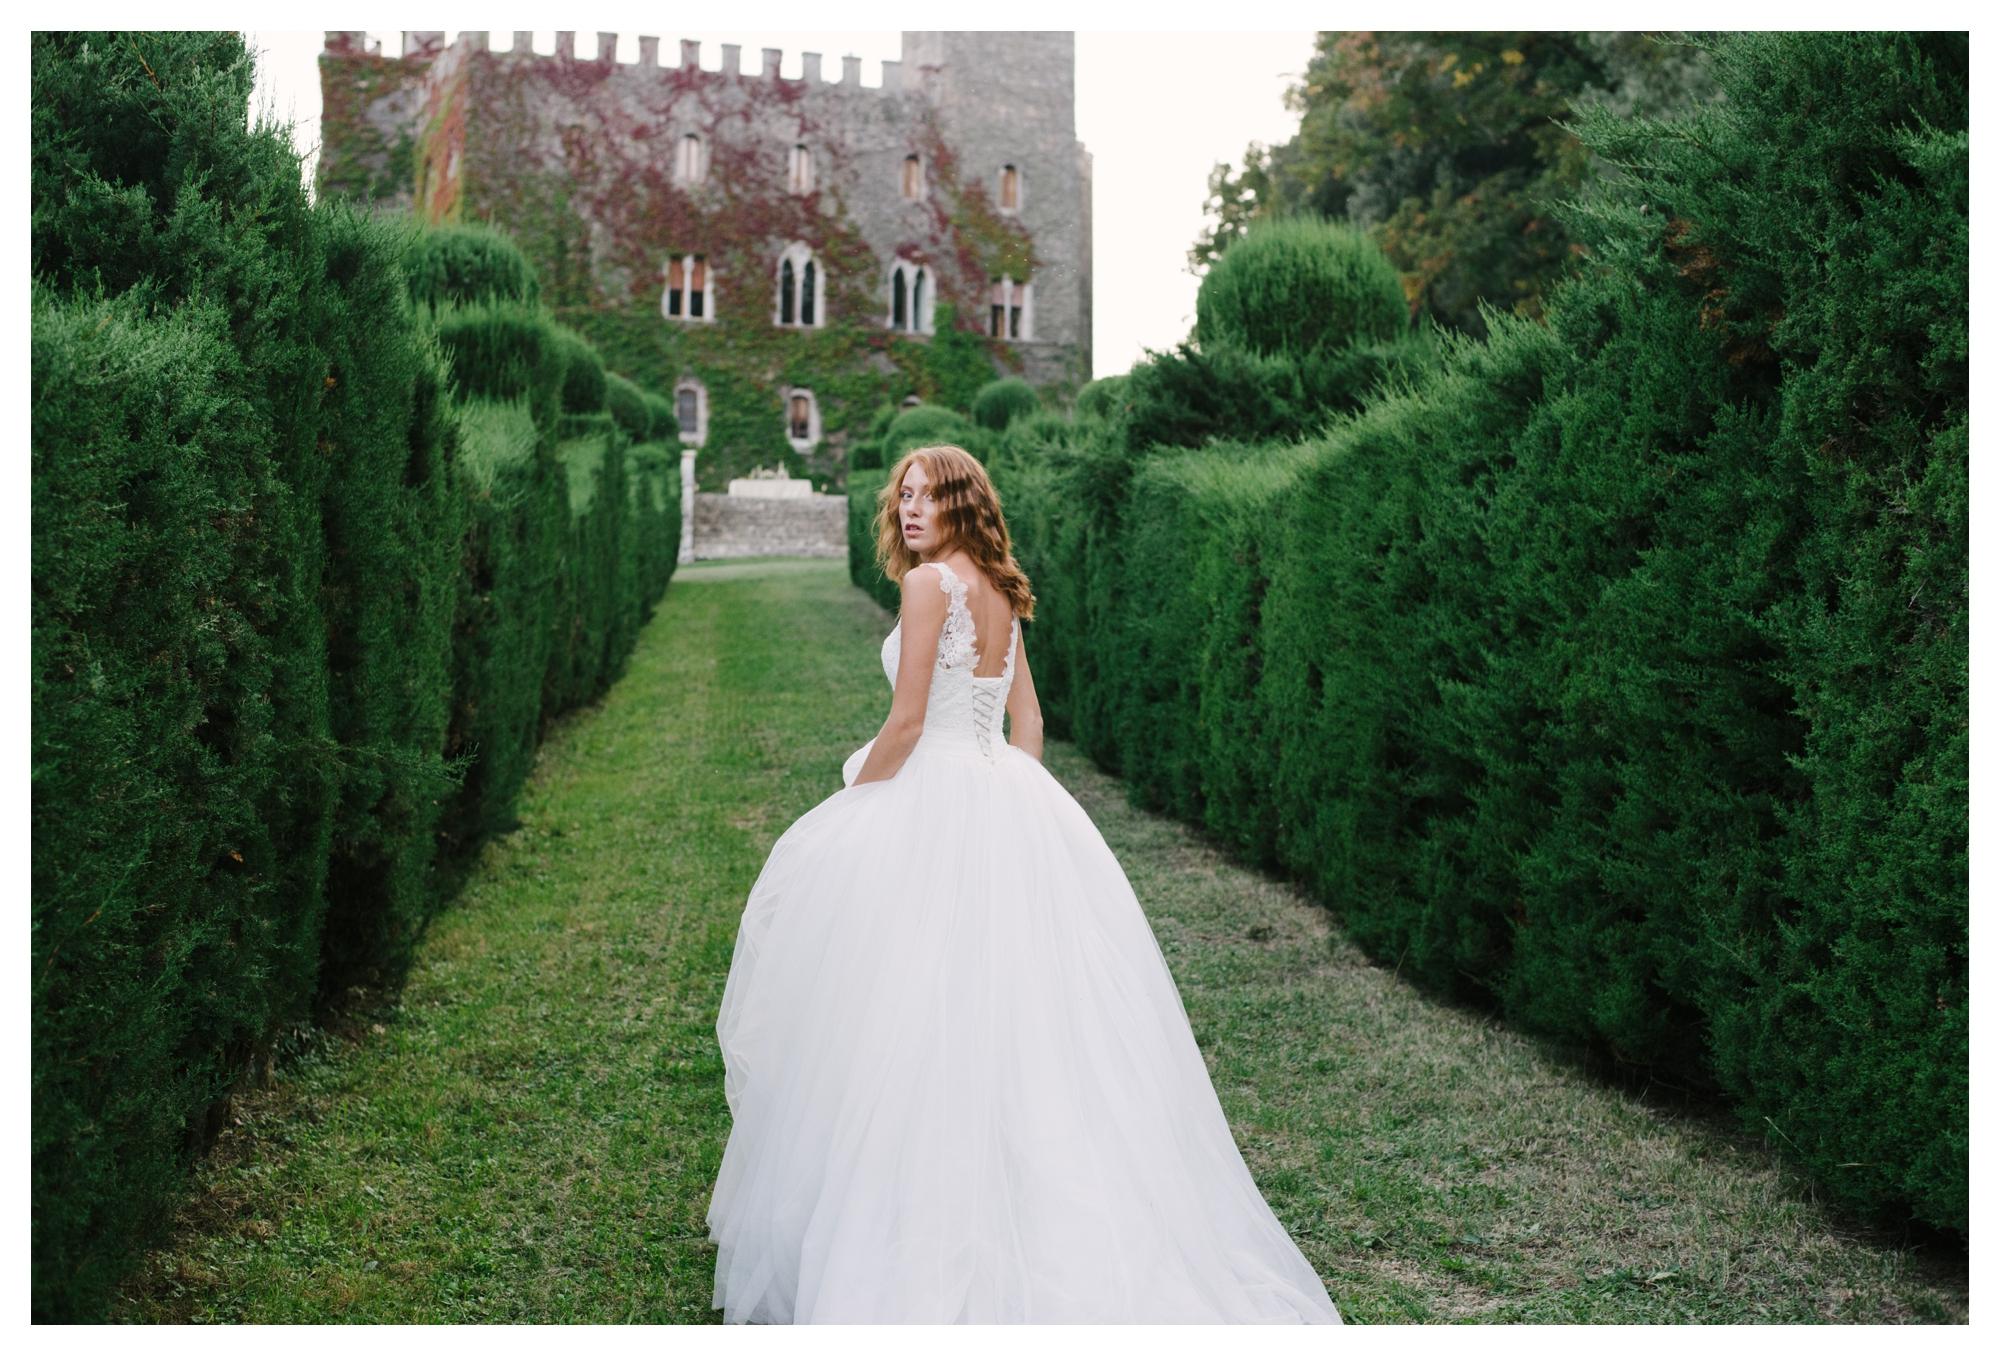 tuscany-castle-wedding-photographer-italy-williamsburgphotostudios-_0014.jpg